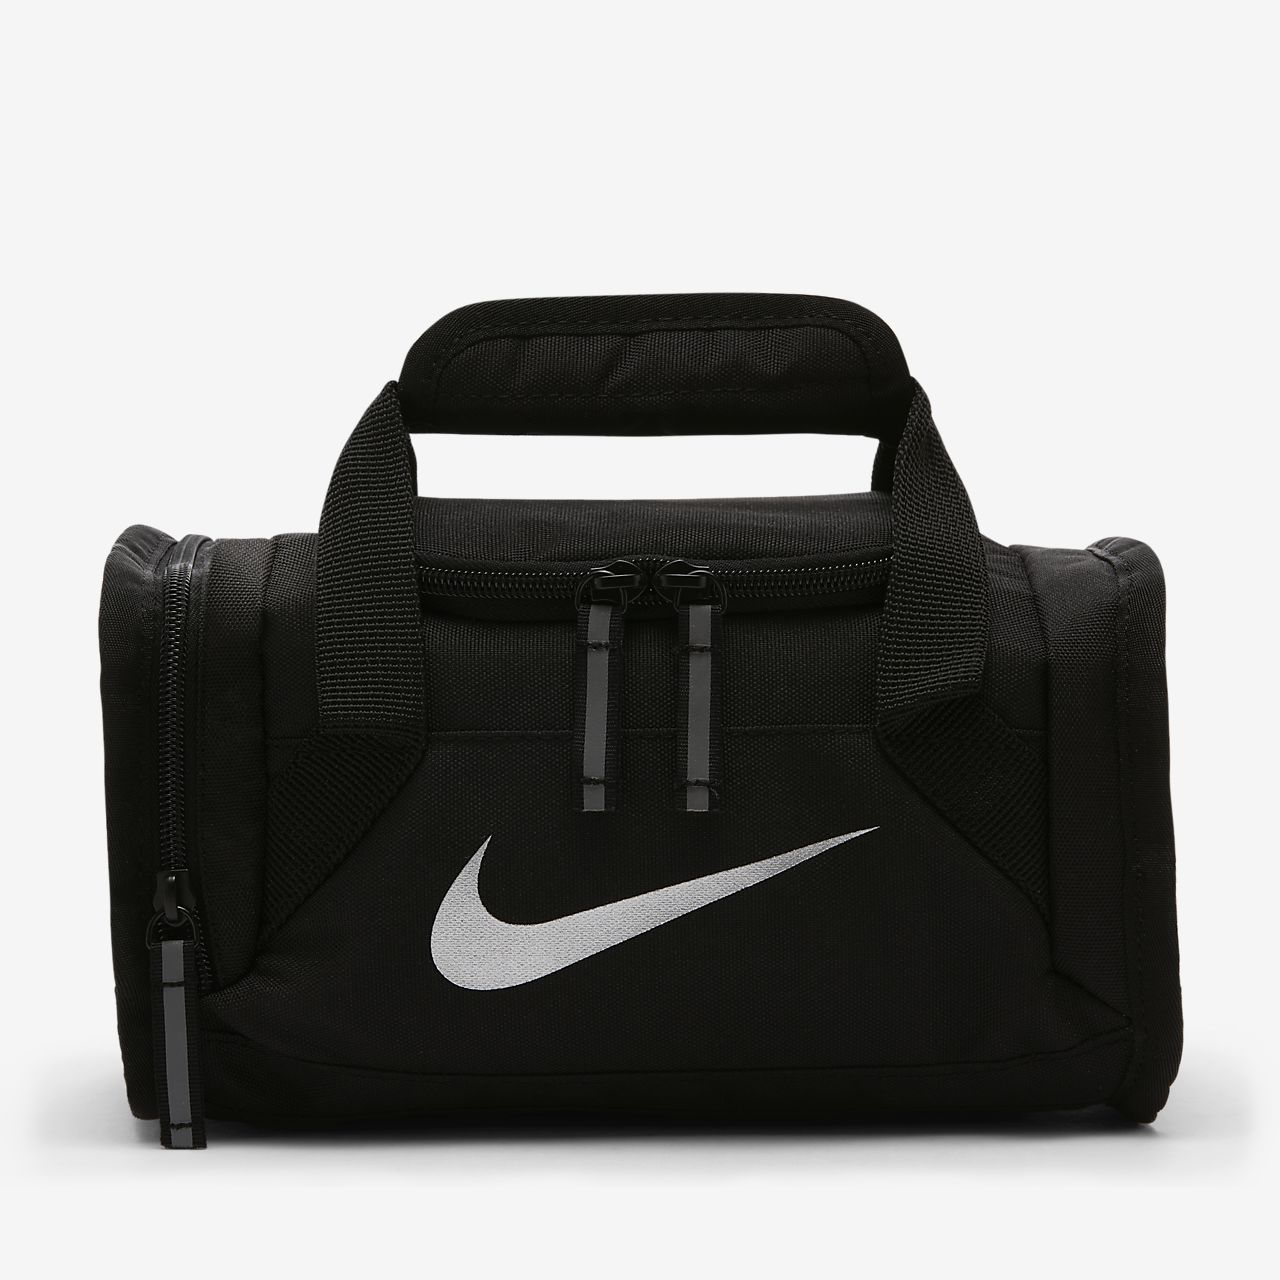 Borsa portapranzo Nike Brasilia Fuel Pack